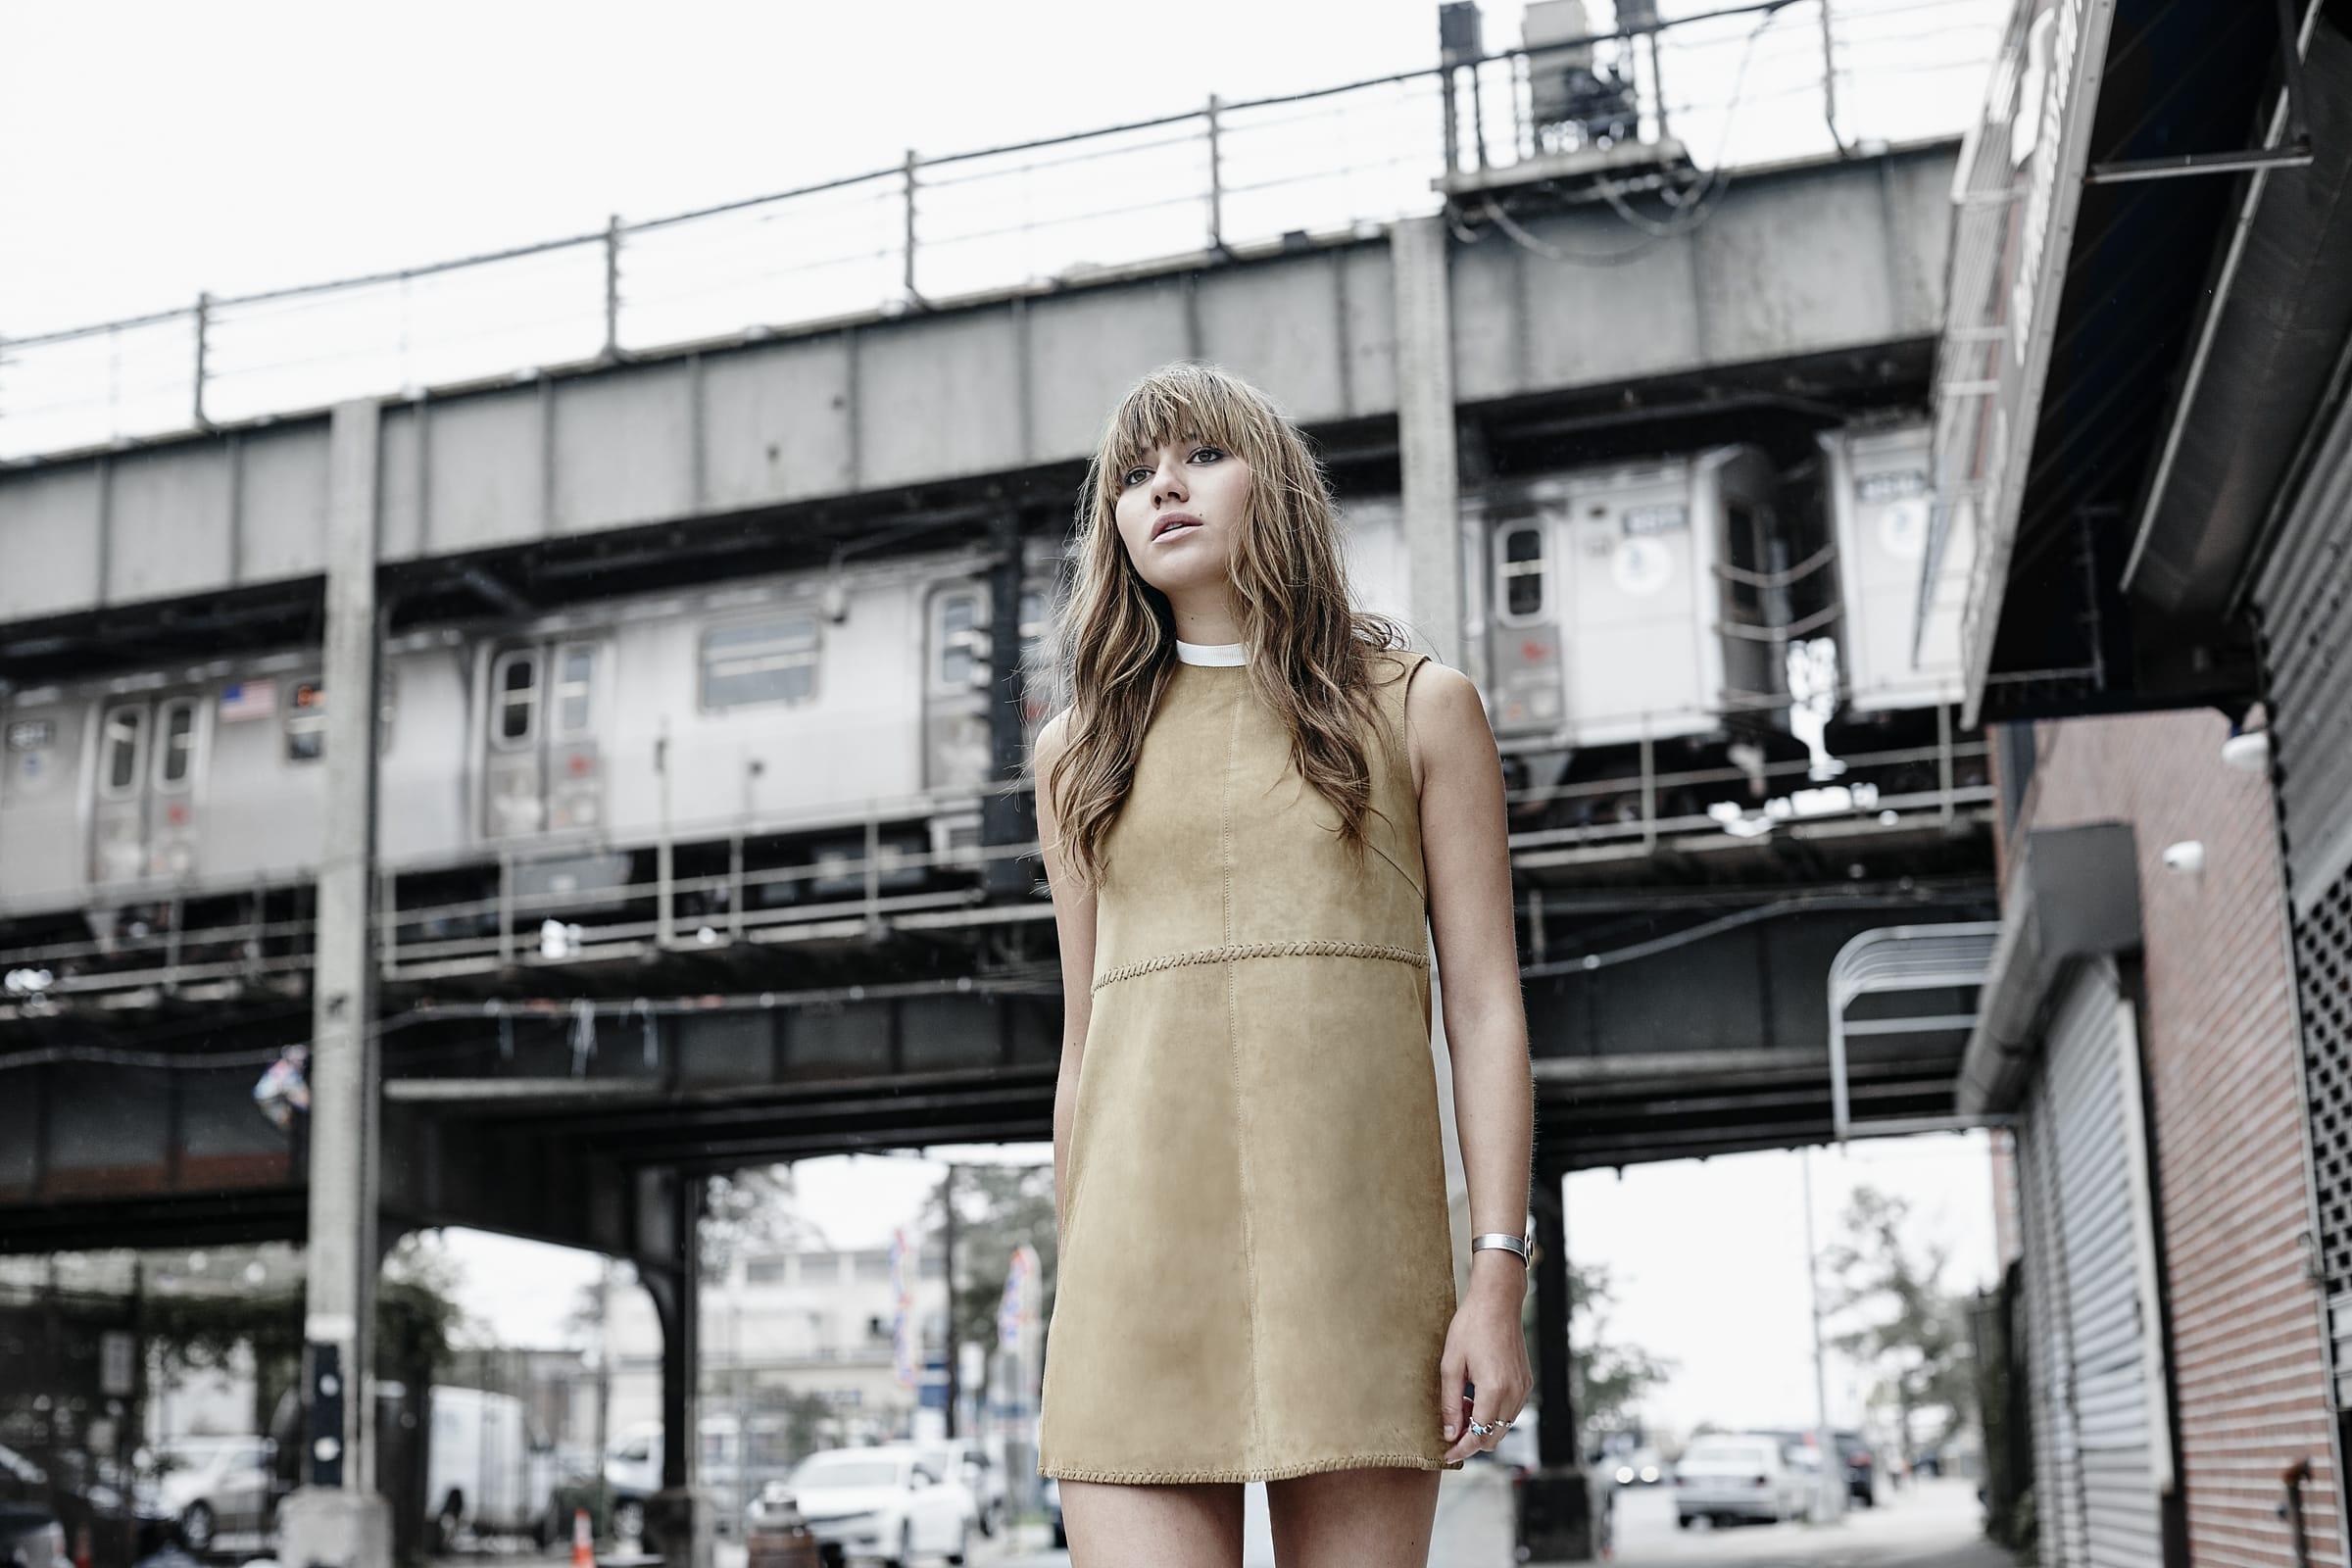 Emden Sand Suede Mini Shift Dress. Shop here: https://www.muubaa.com/dresses-c25/emden-sand-suede-mini-shift-dress-p873